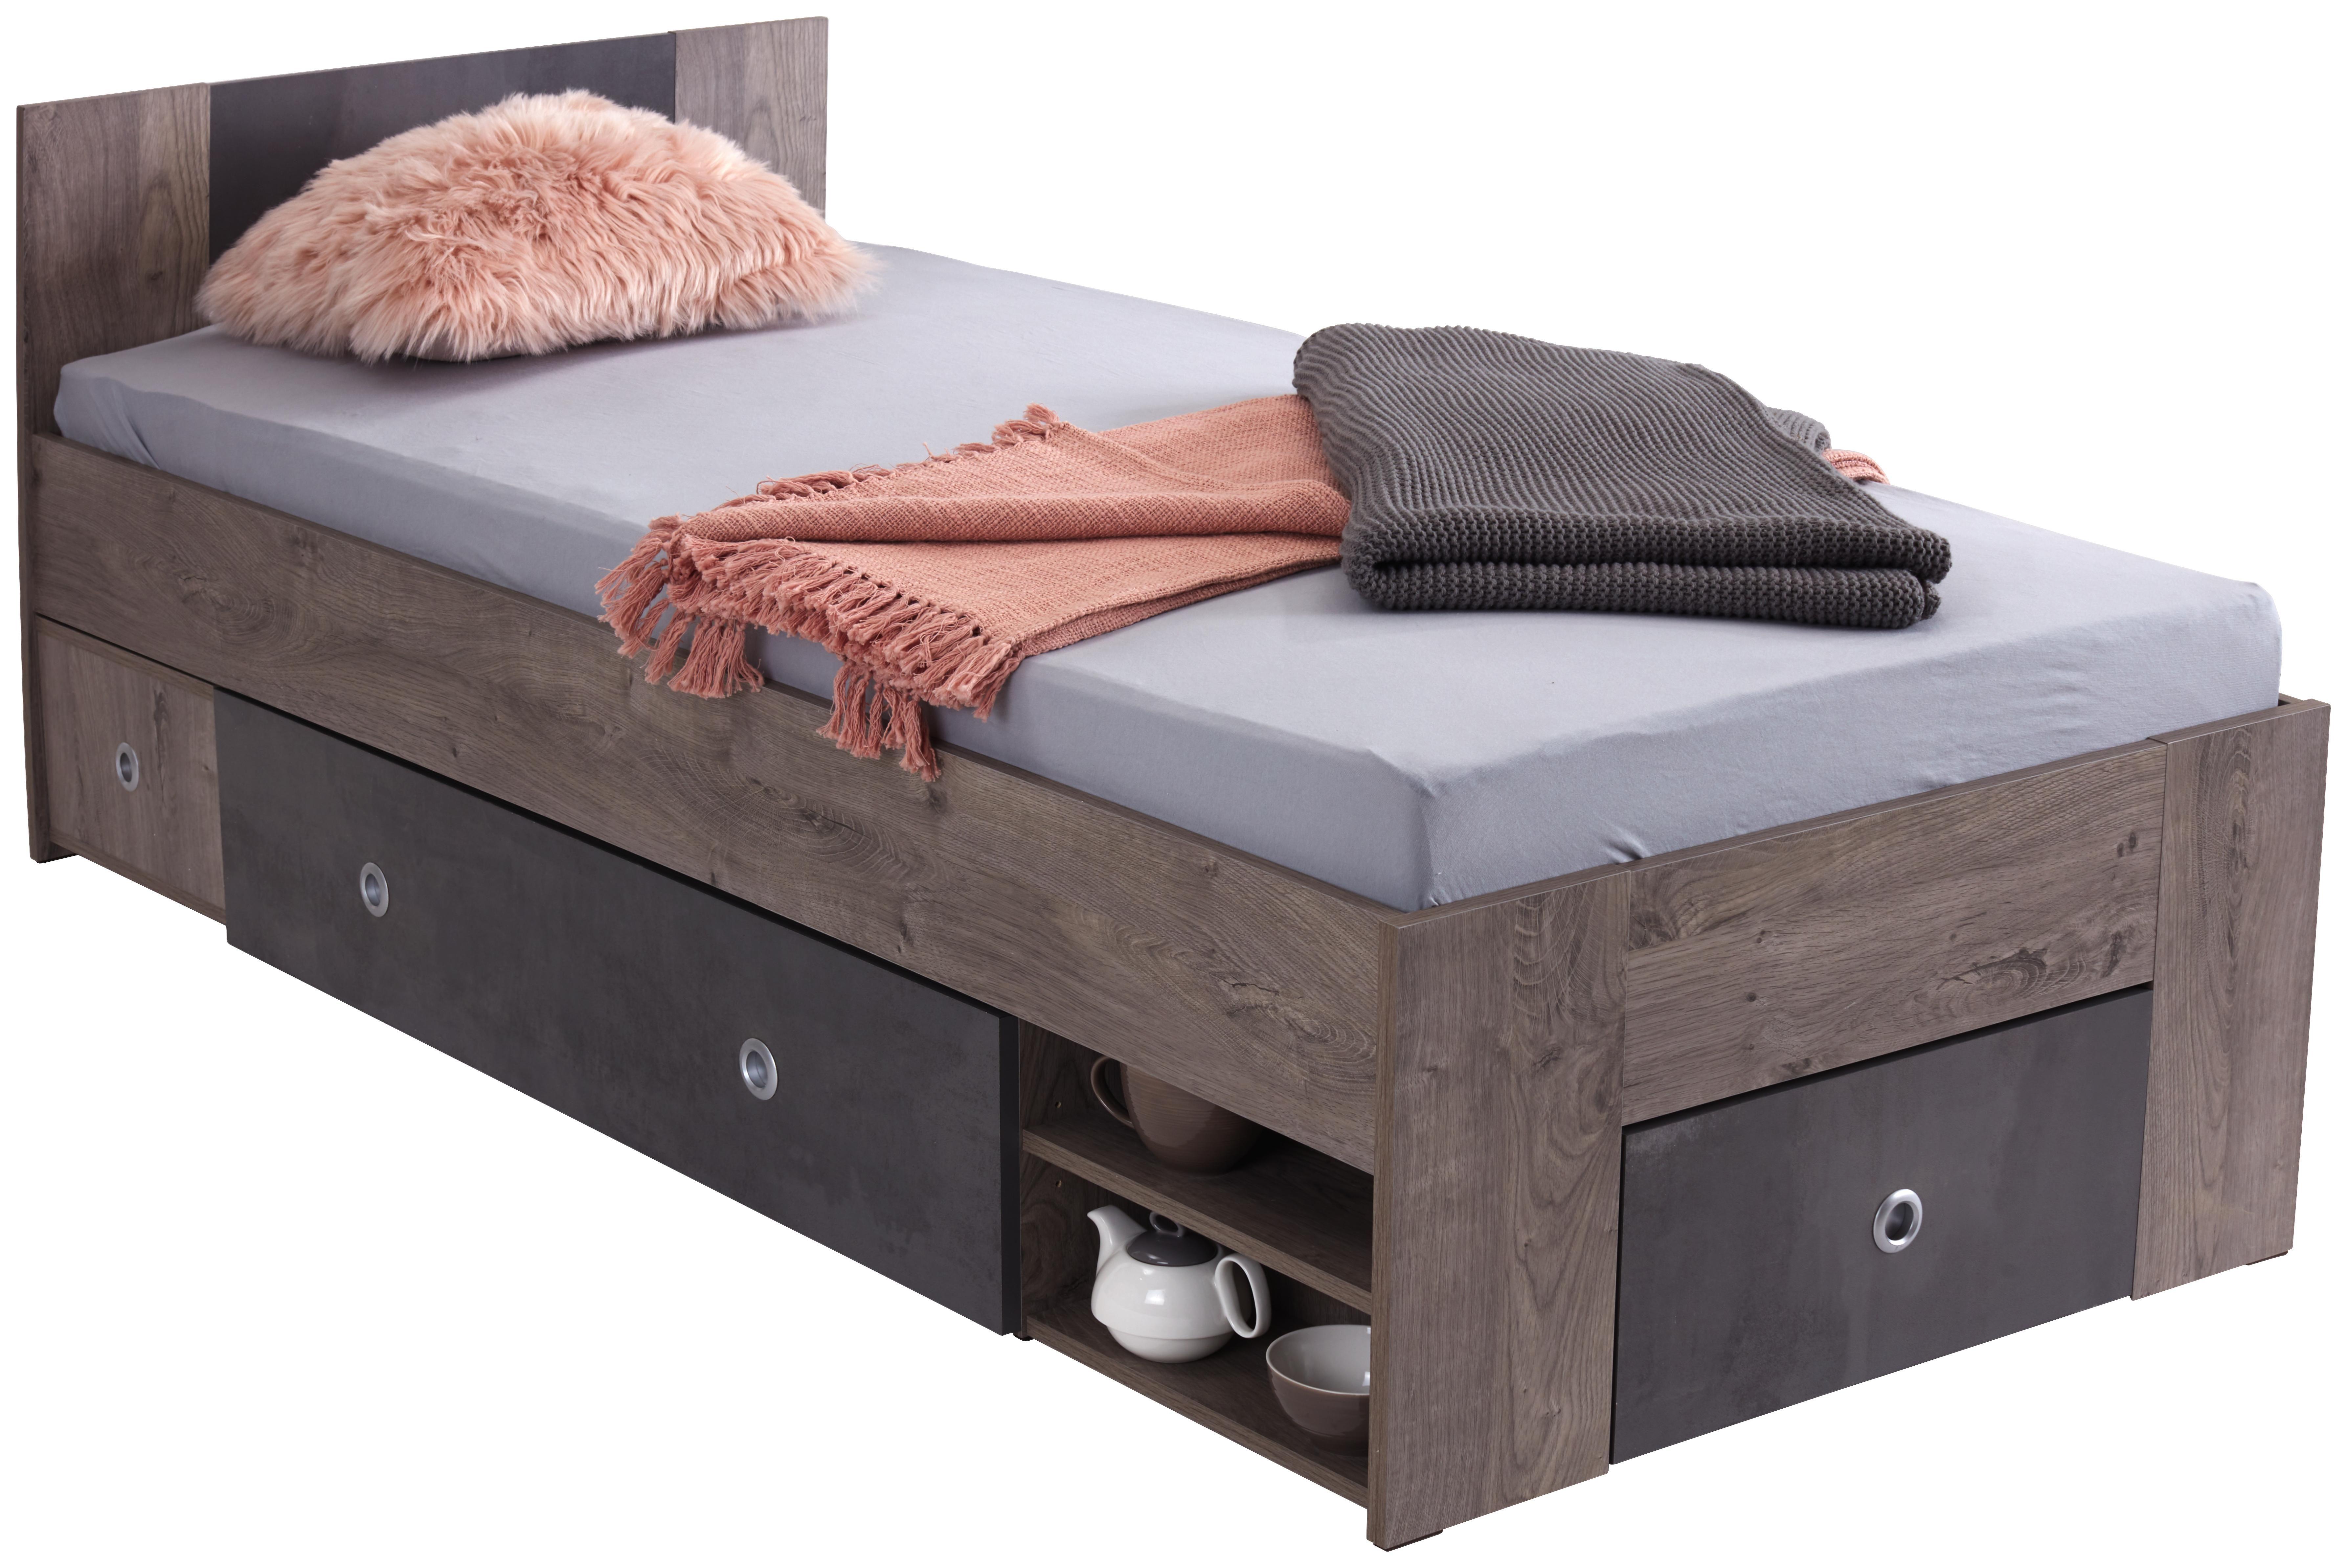 Postelja Azurro 90 - hrast, Moderno, leseni material (204/75/95cm) - Mömax modern living